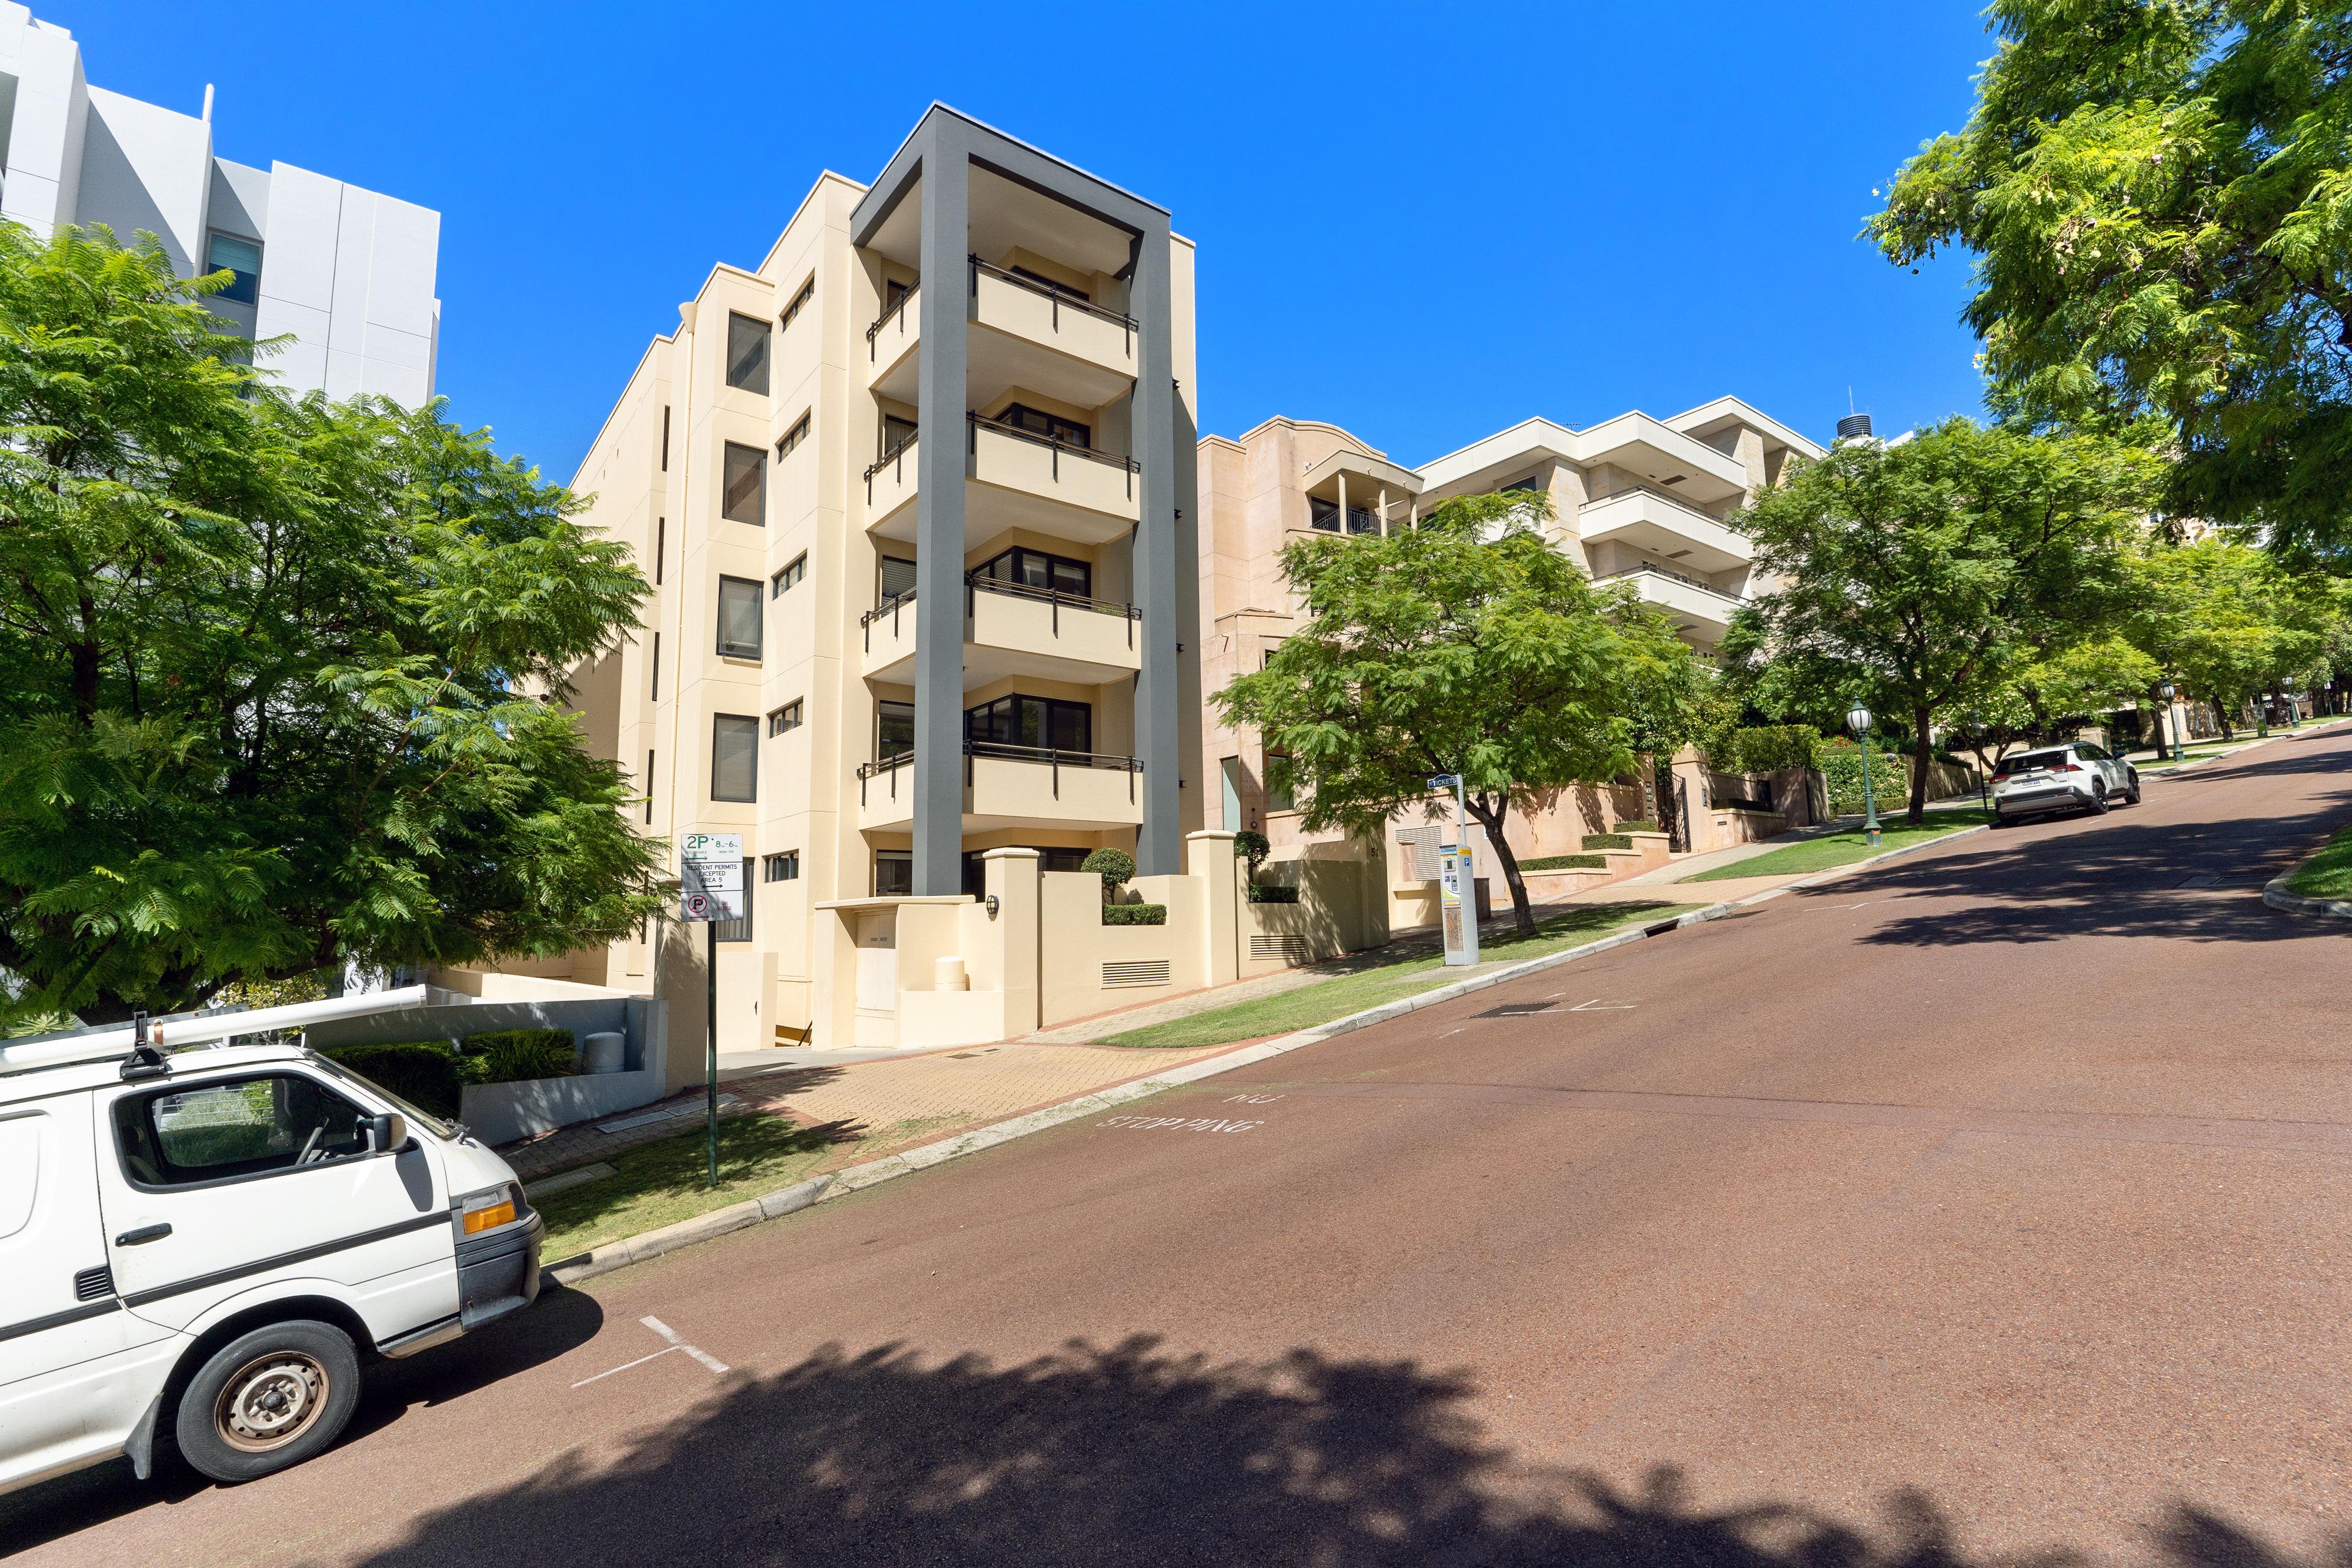 PRINT 1 51 Mount Street, West Perth 24